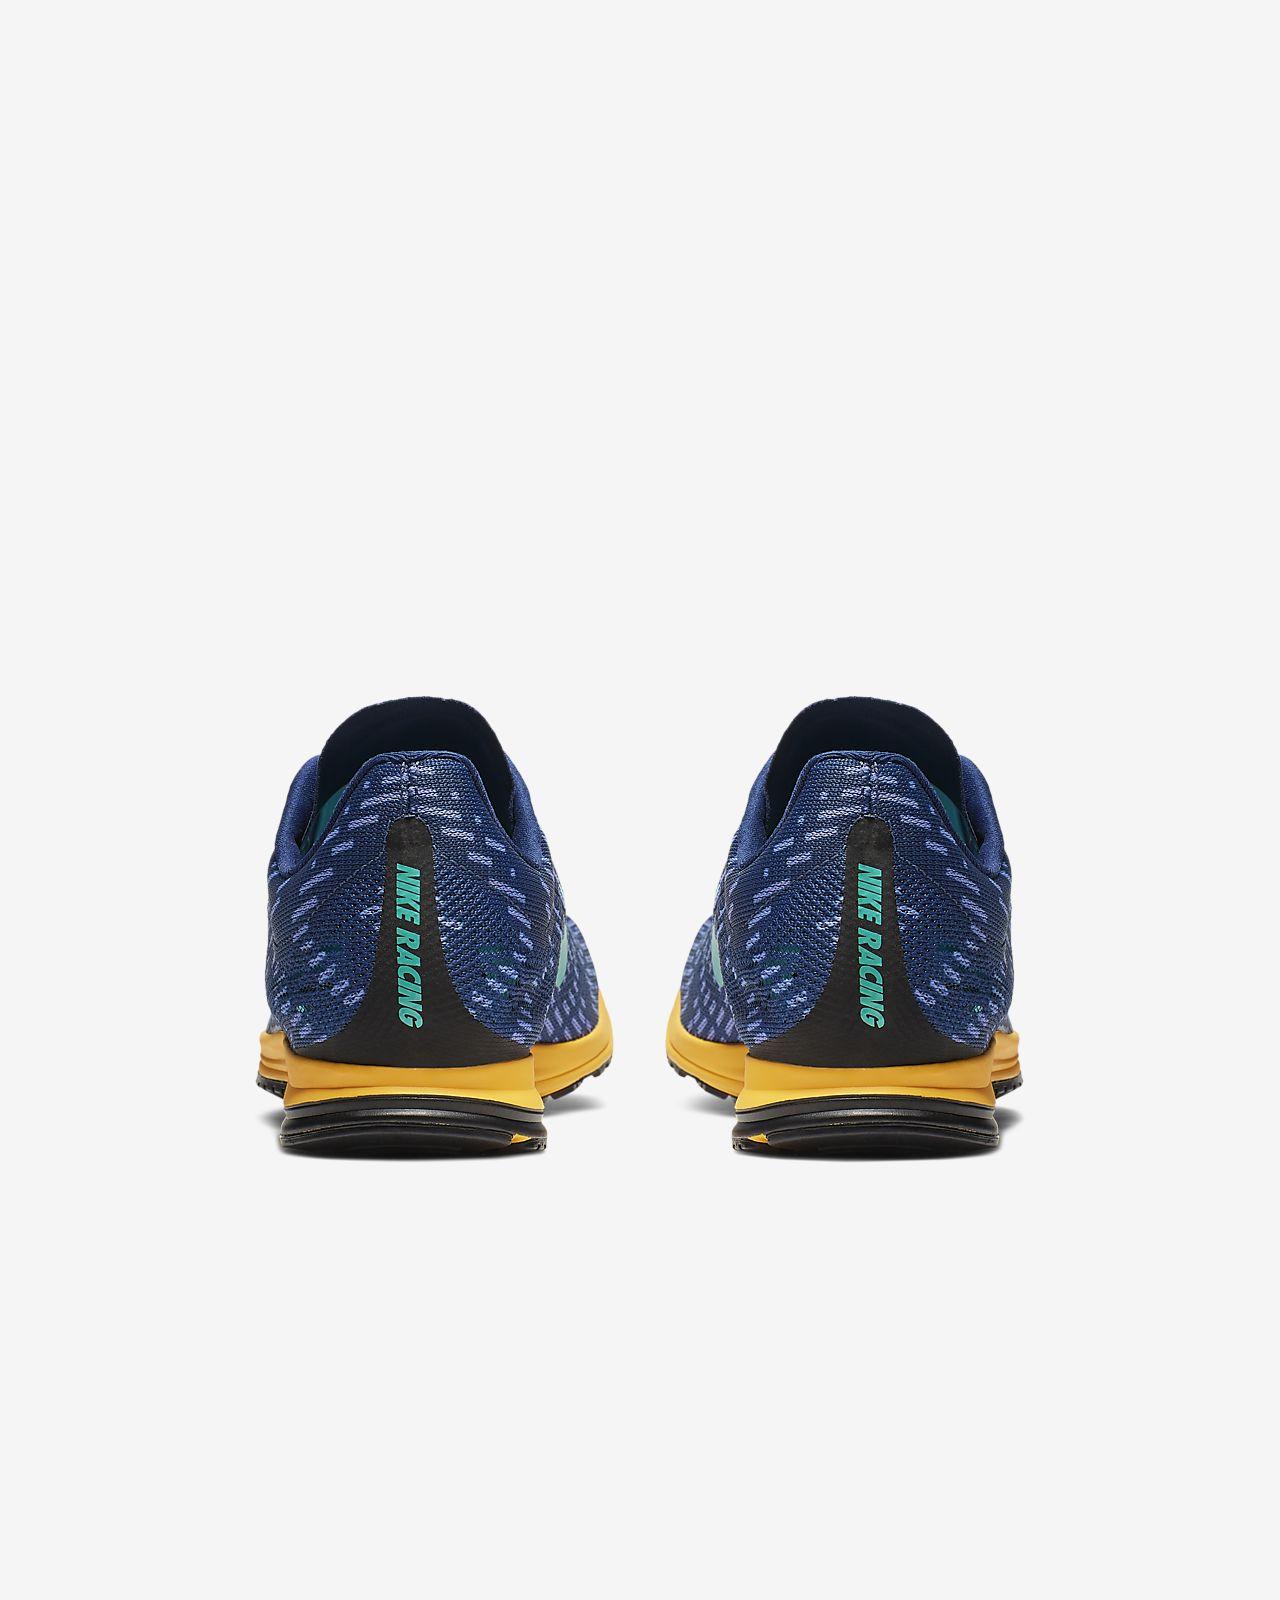 6217dc21c4b Nike Air Zoom Streak LT 4 Racing Shoe. Nike.com